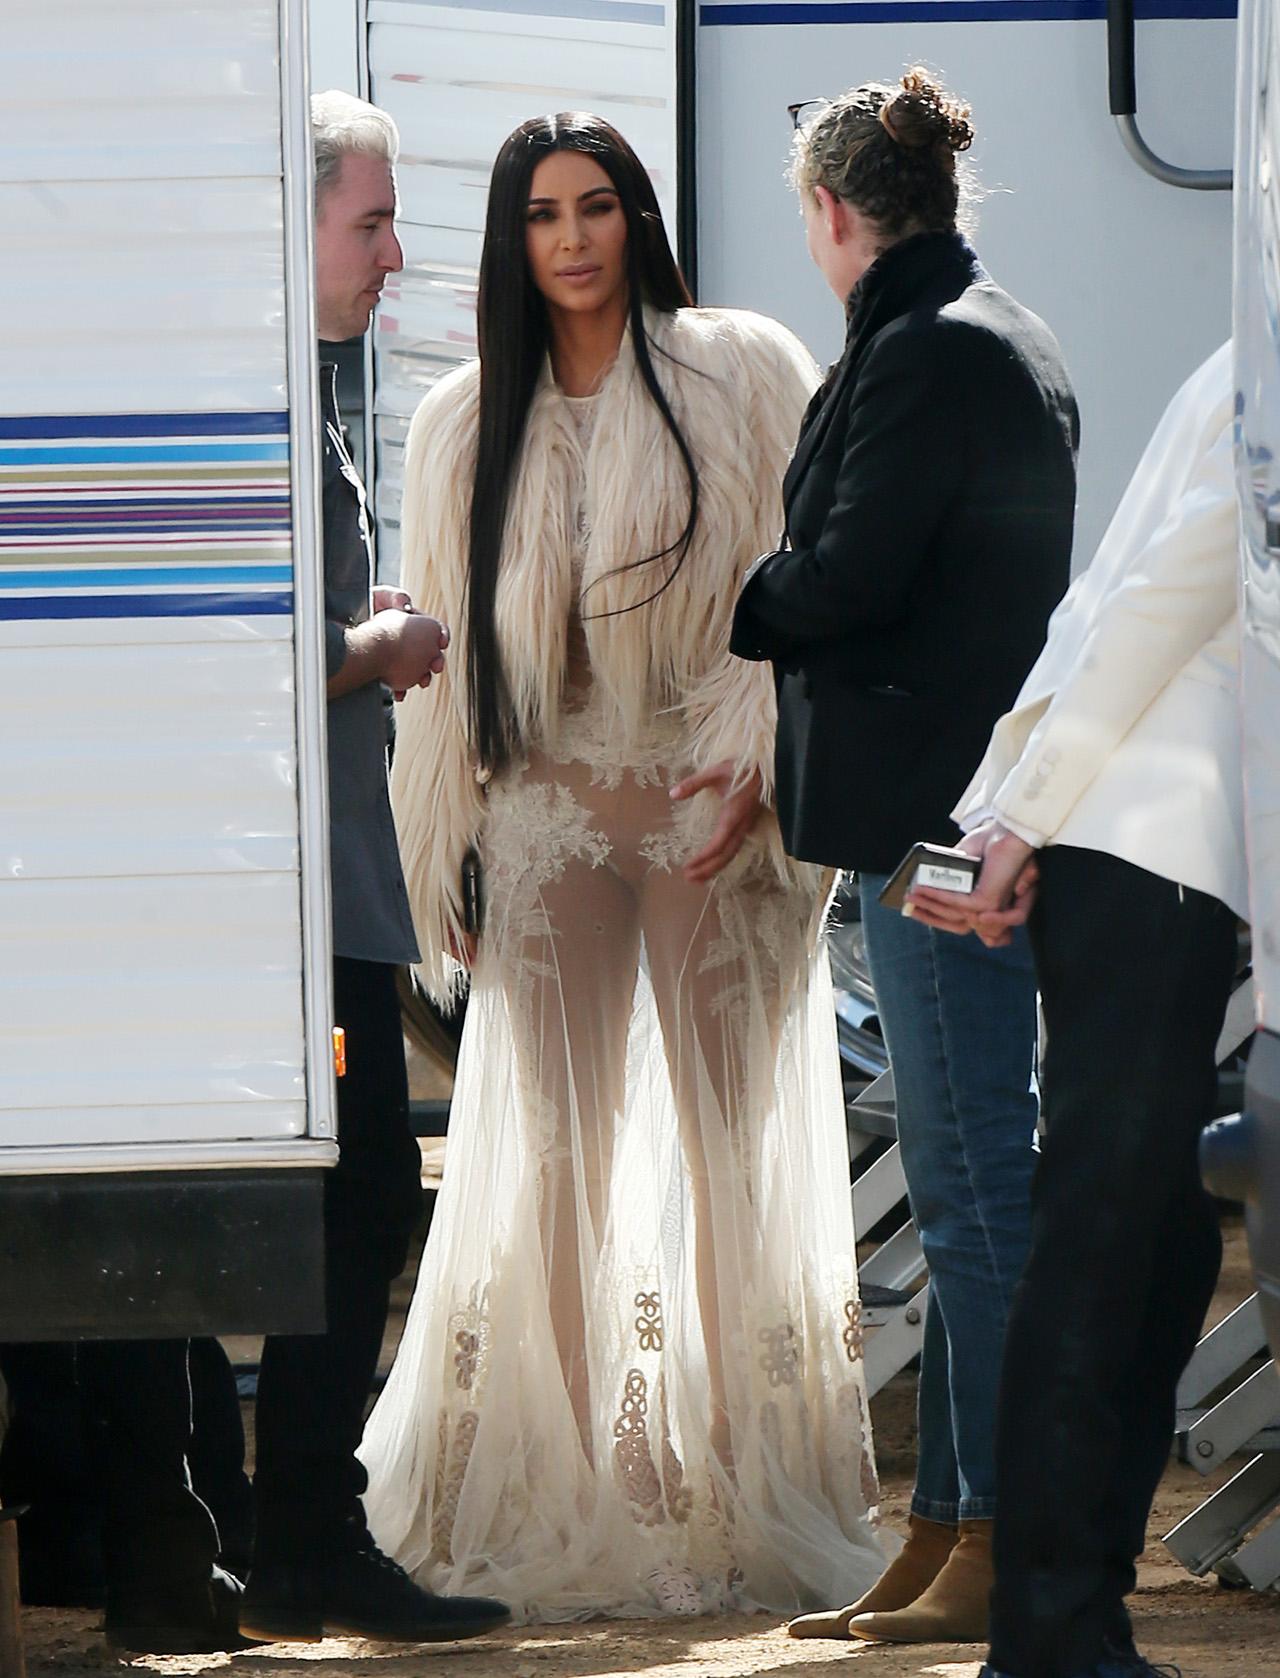 kim kardashian dons same sheer gown to film more oceans